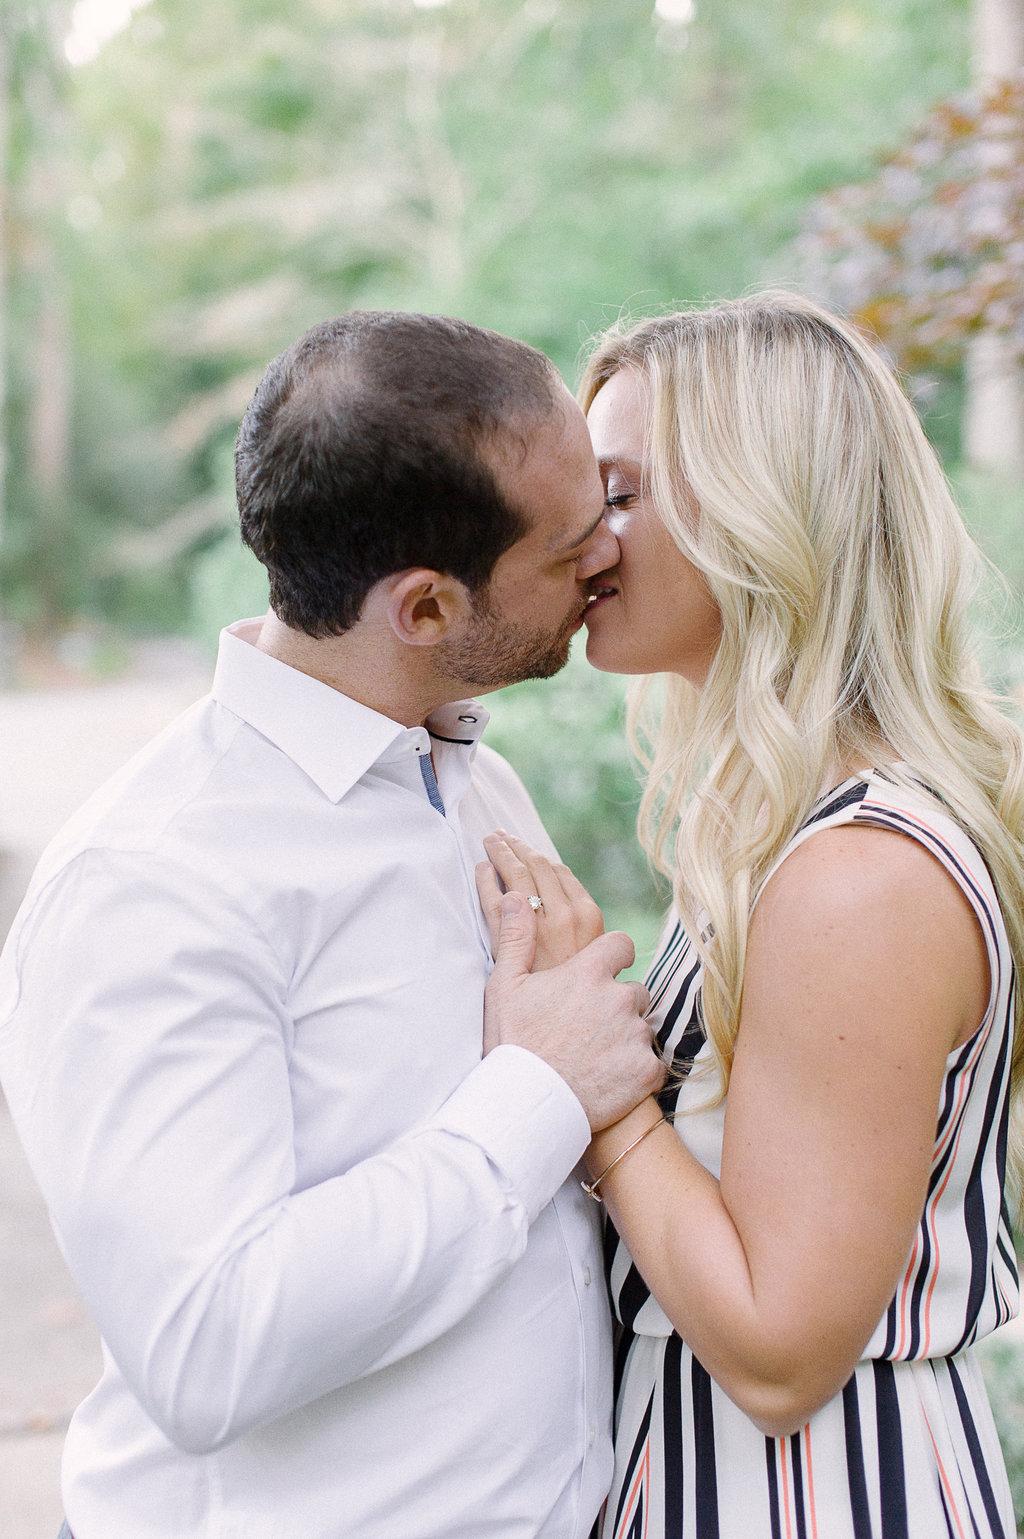 Cator-Woolford-Gardens-Engagement-atlanta-wedding-photographer-hannah-forsberg-15.jpg